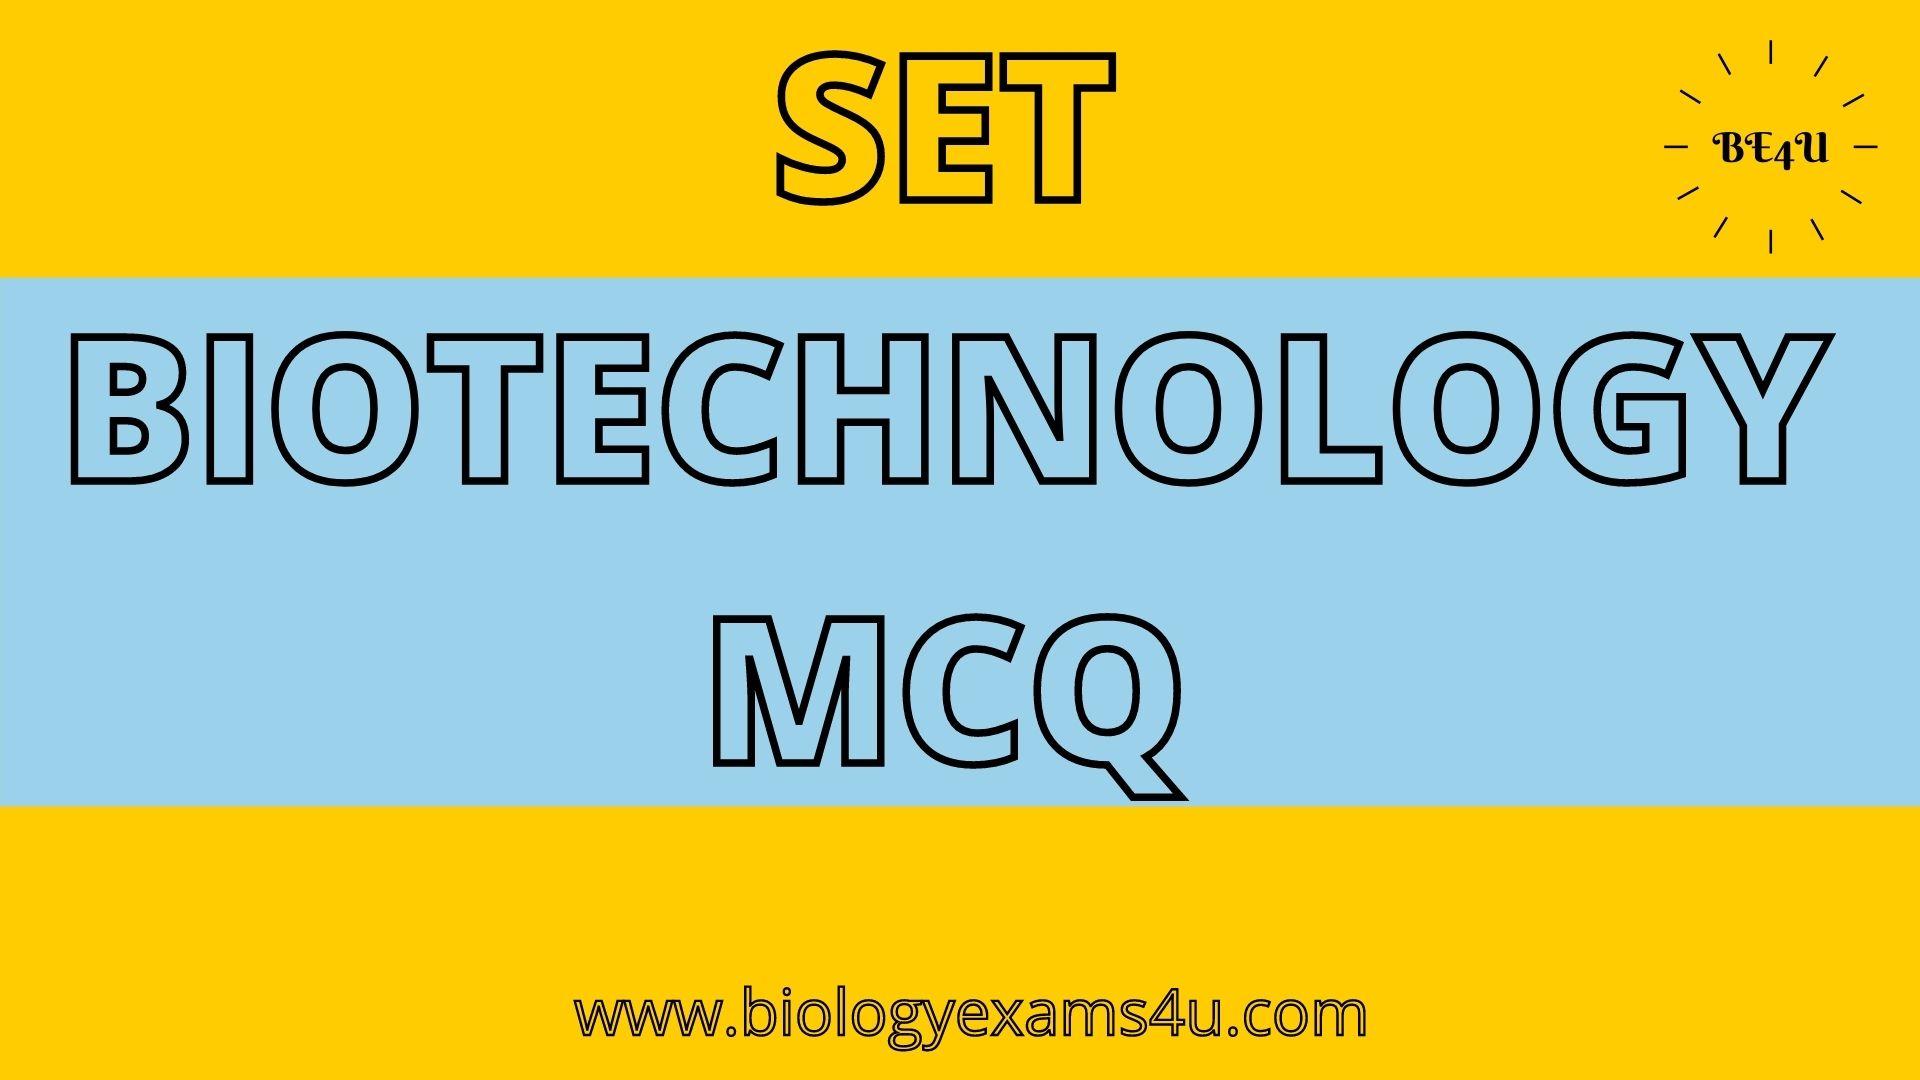 SET Biotechnology MCQ - PG Level Questions